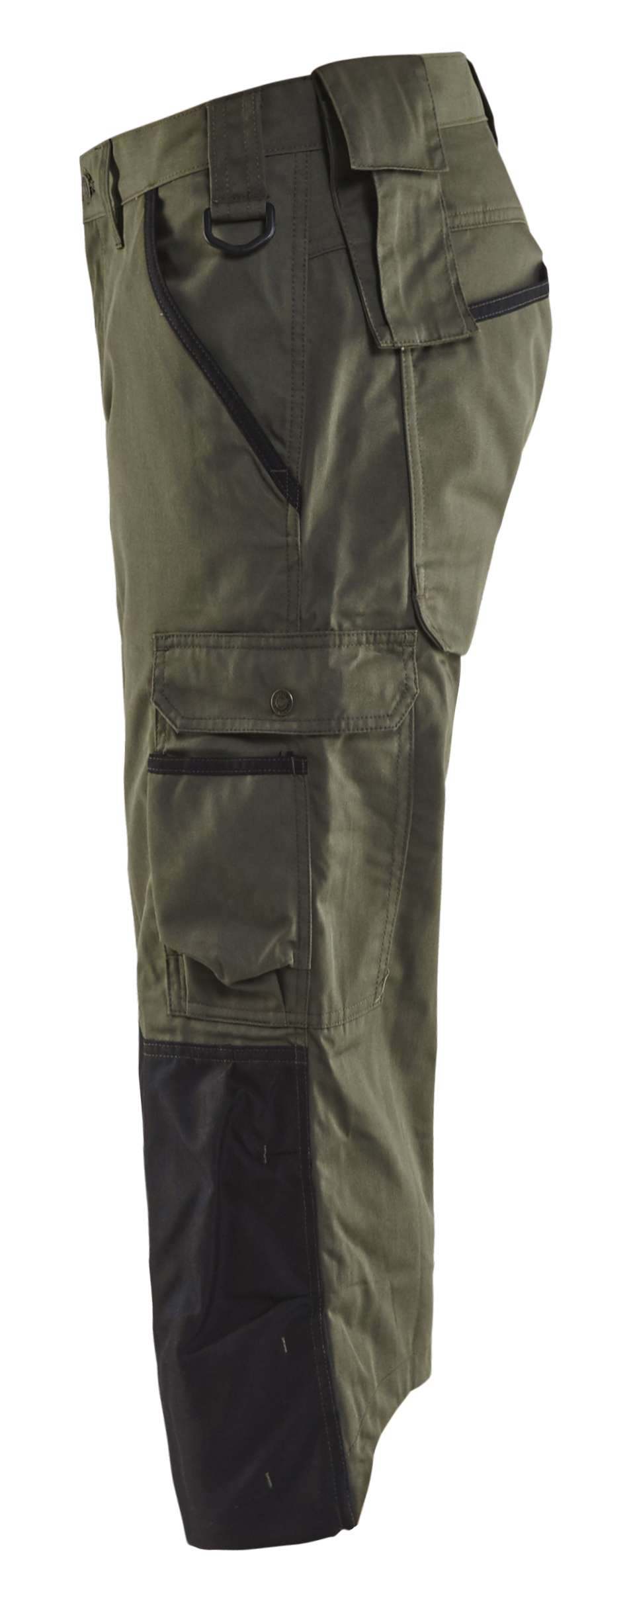 Blaklader Piraatbroeken 14551835 army groen-zwart(4699)